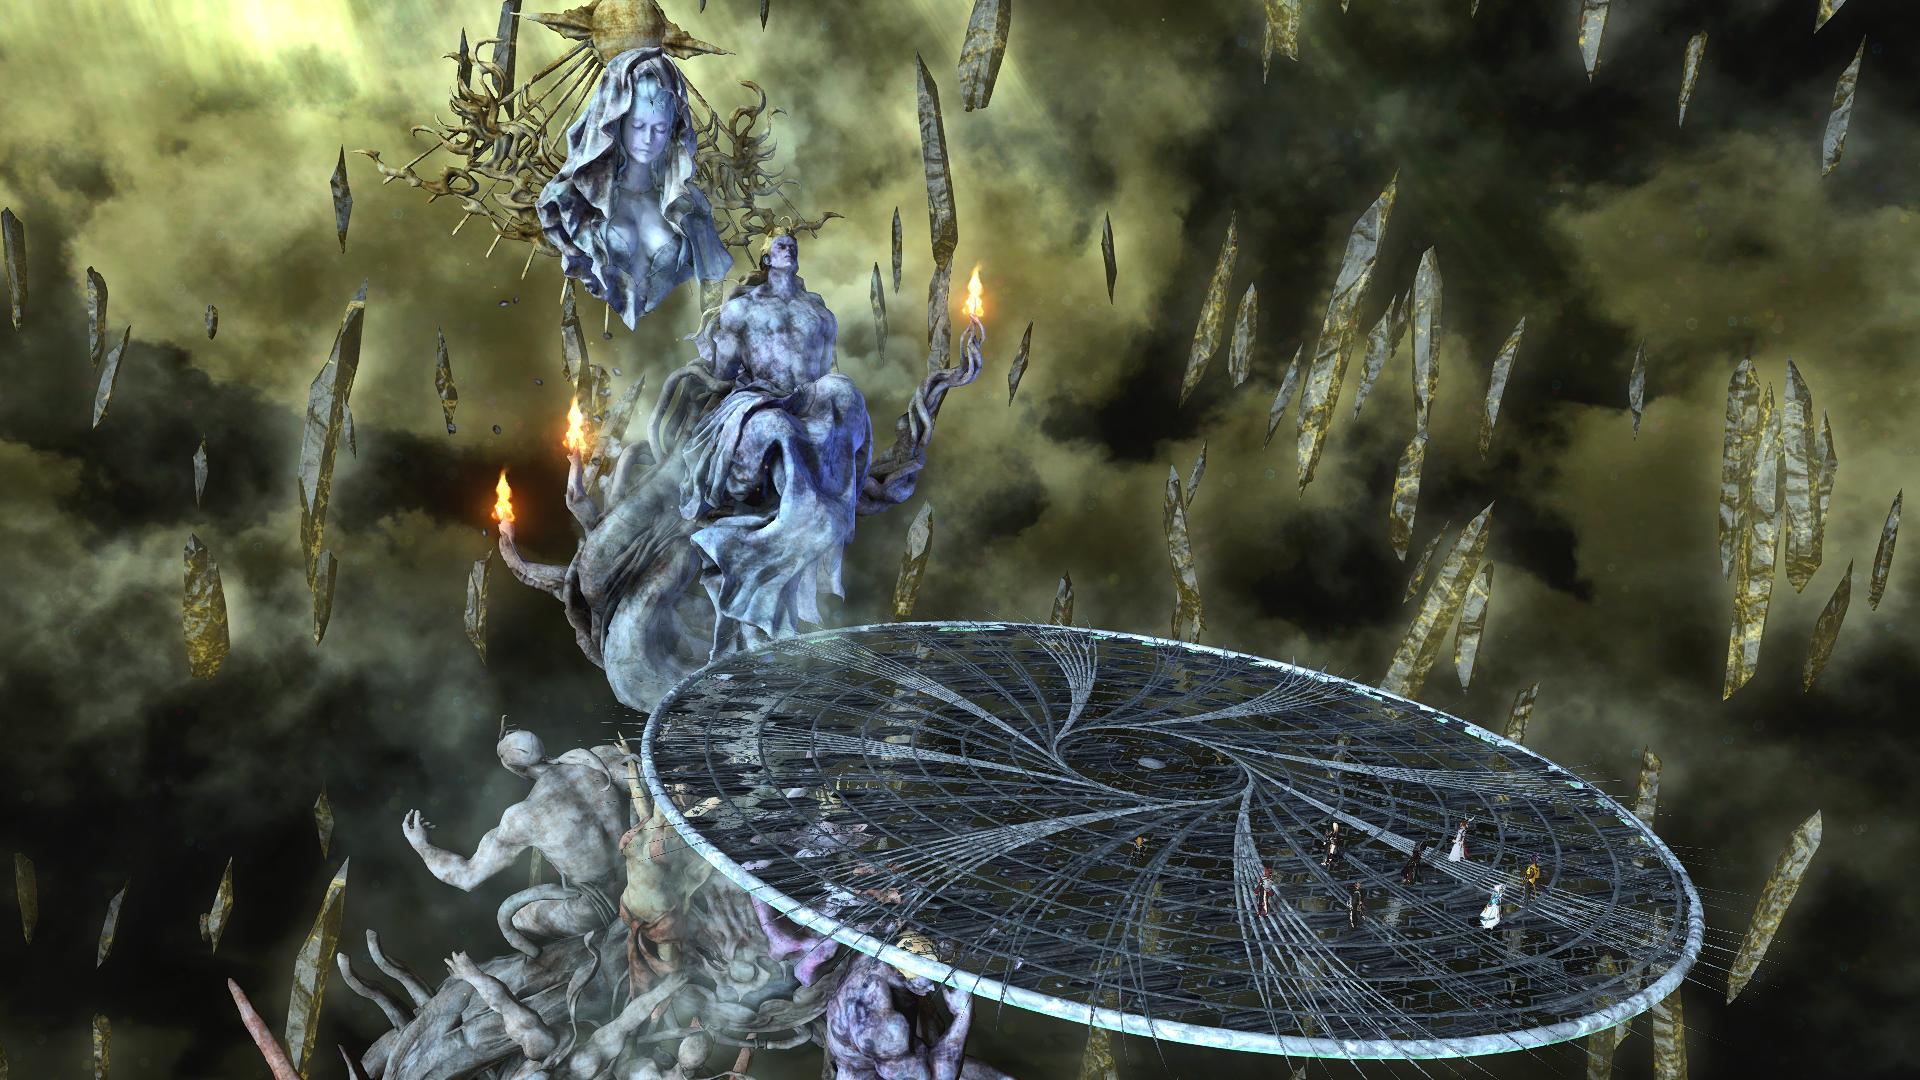 Statue of the Gods | Final Fantasy Wiki | FANDOM powered by Wikia